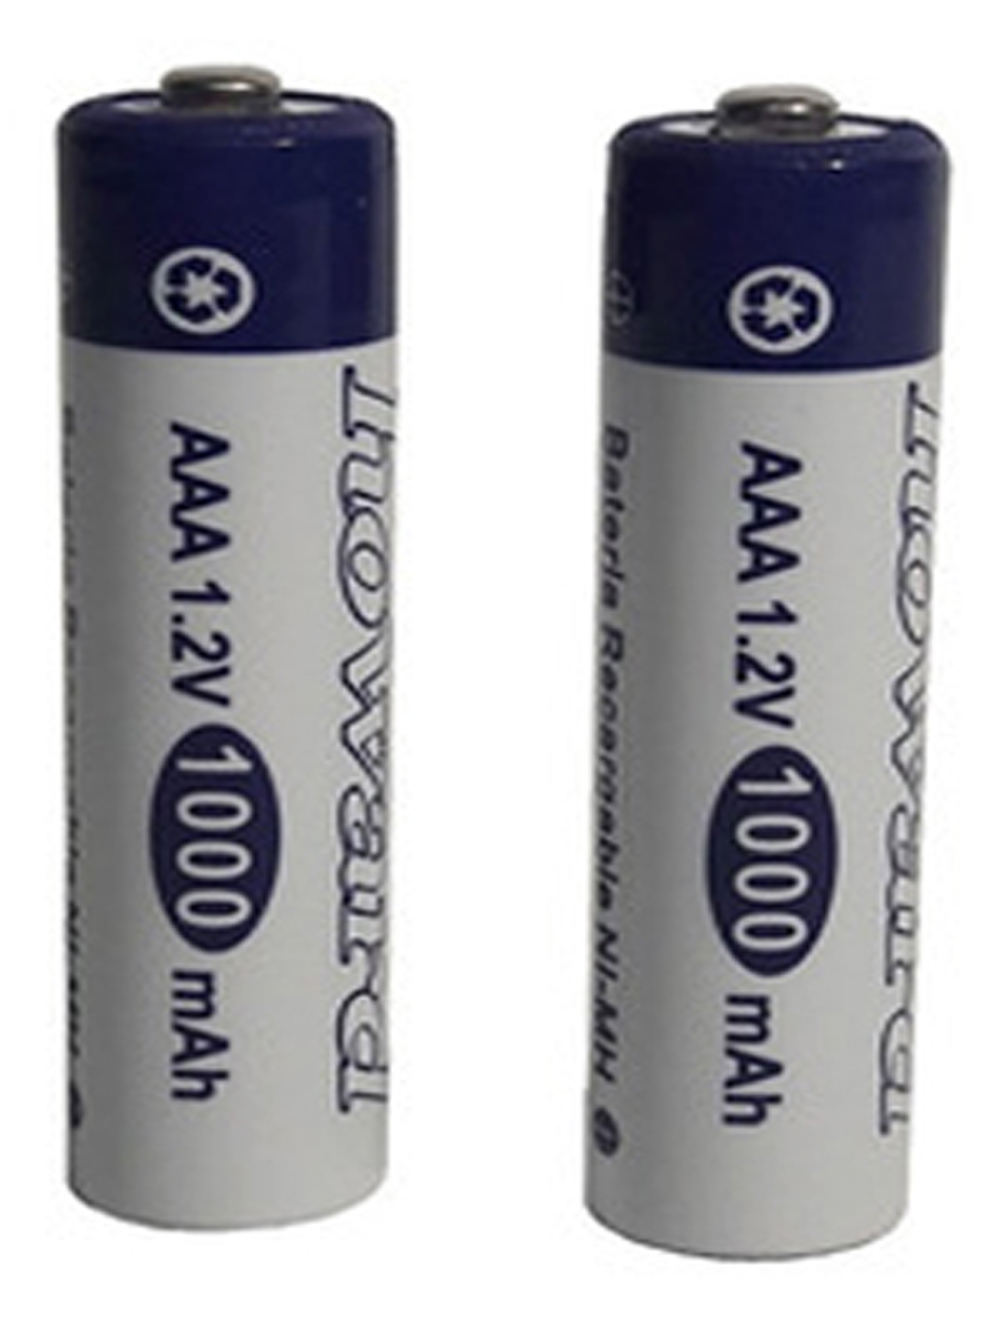 bateria aaa recargable at view 1000 ma